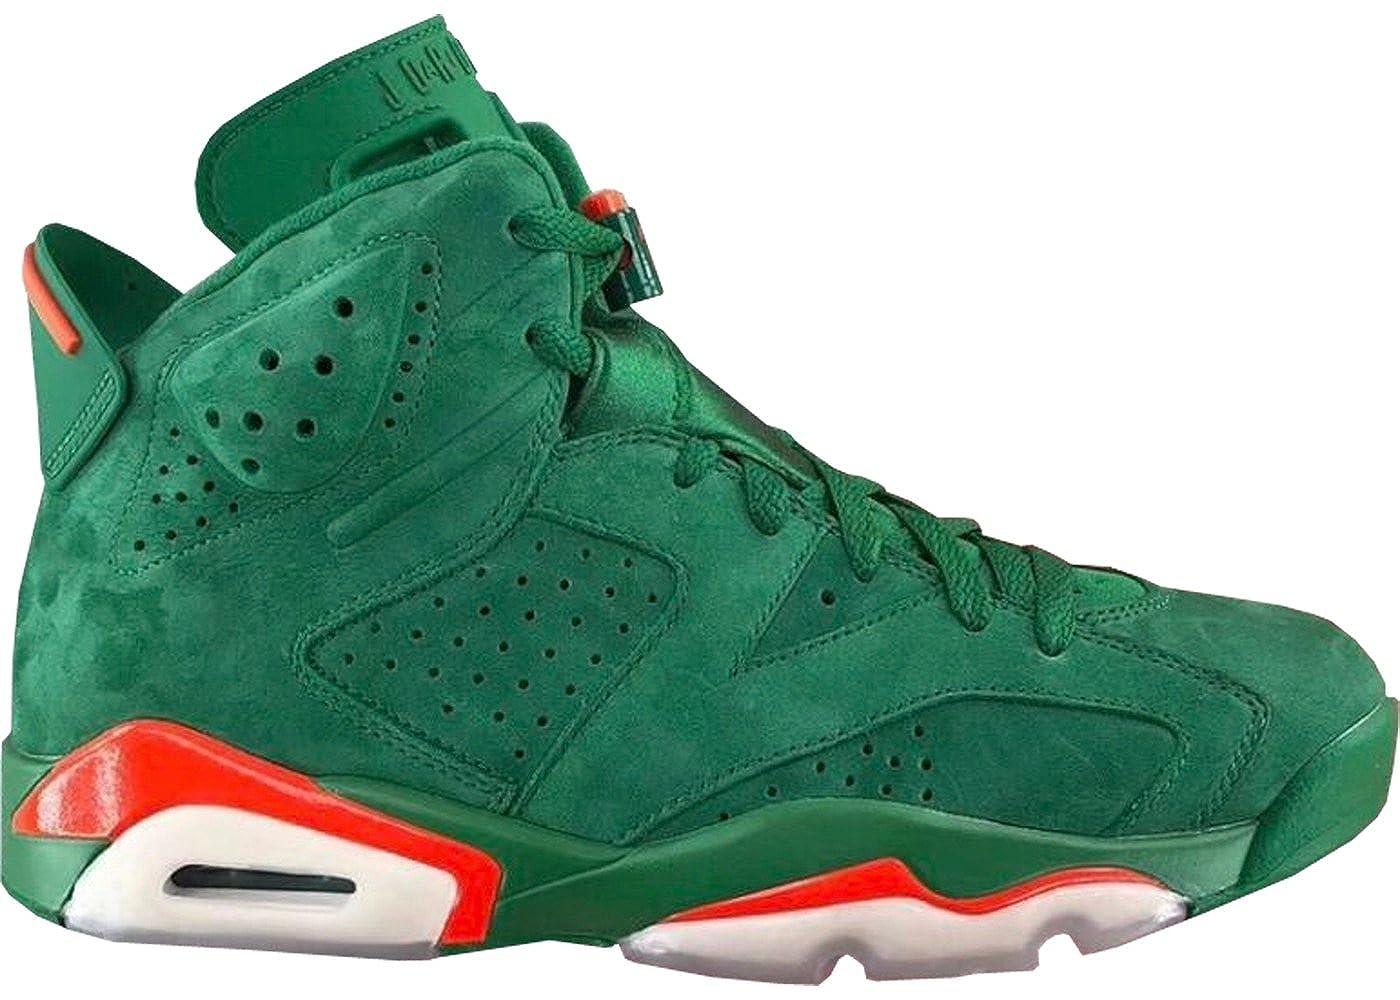 [ナイキ] Air Jordan 6 Gatorade Green AJ5986-335 US 11   B079B6XN9D